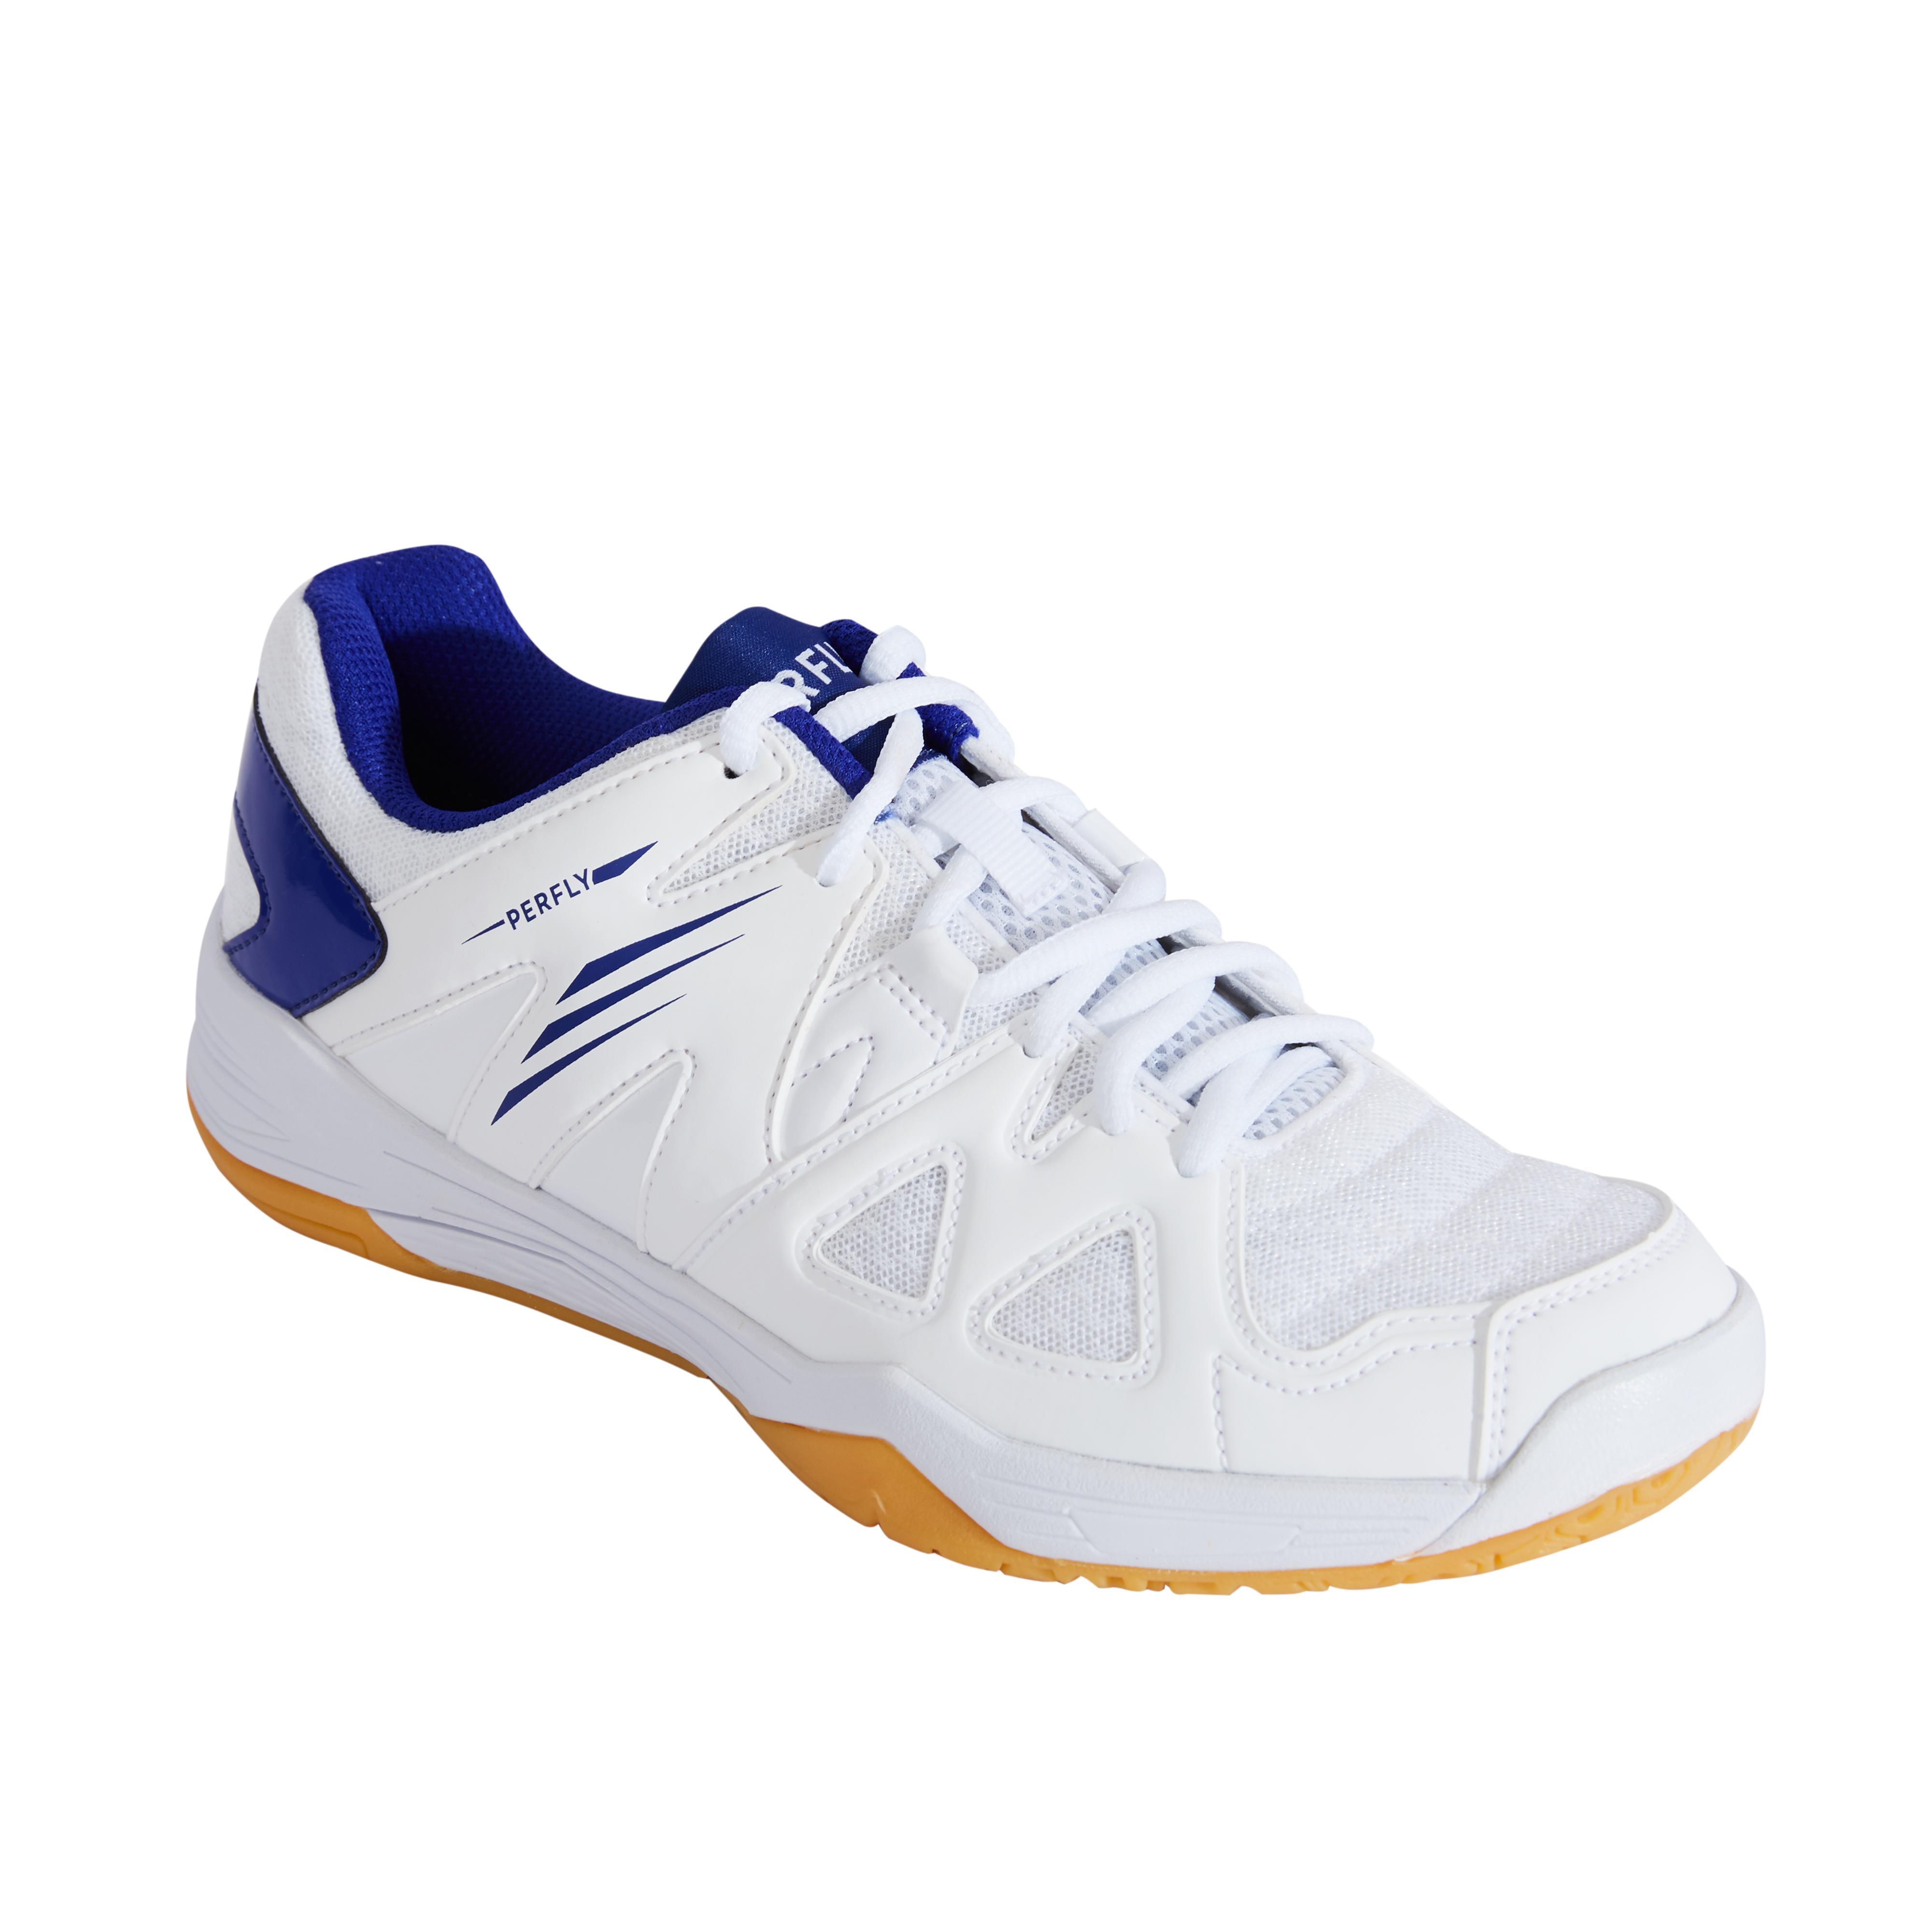 PERFLY Chaussures De Badminton Femme BS530 - Blanc/Bleu - PERFLY - 41